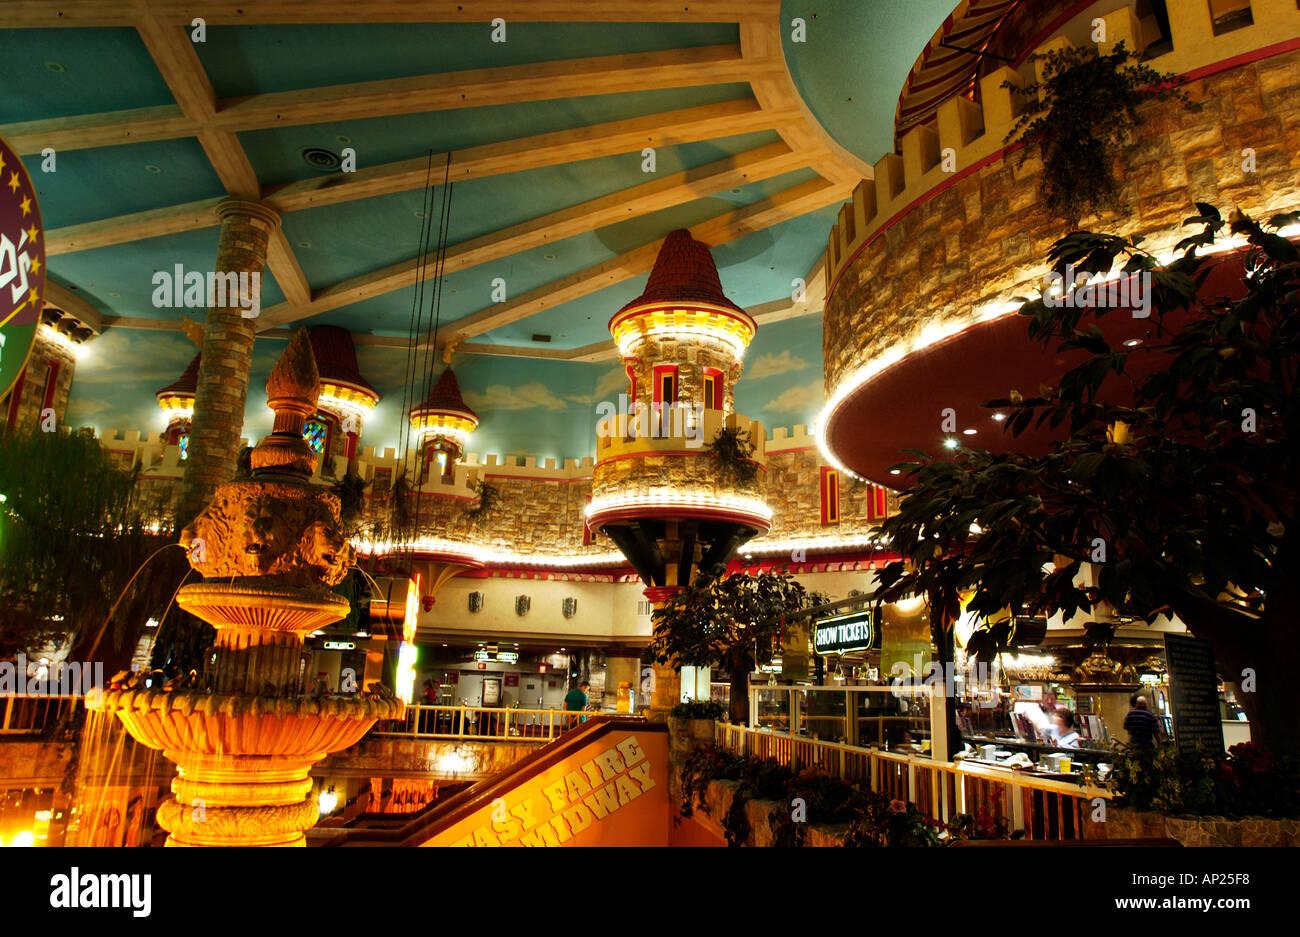 Las Vegas Castle Hotel